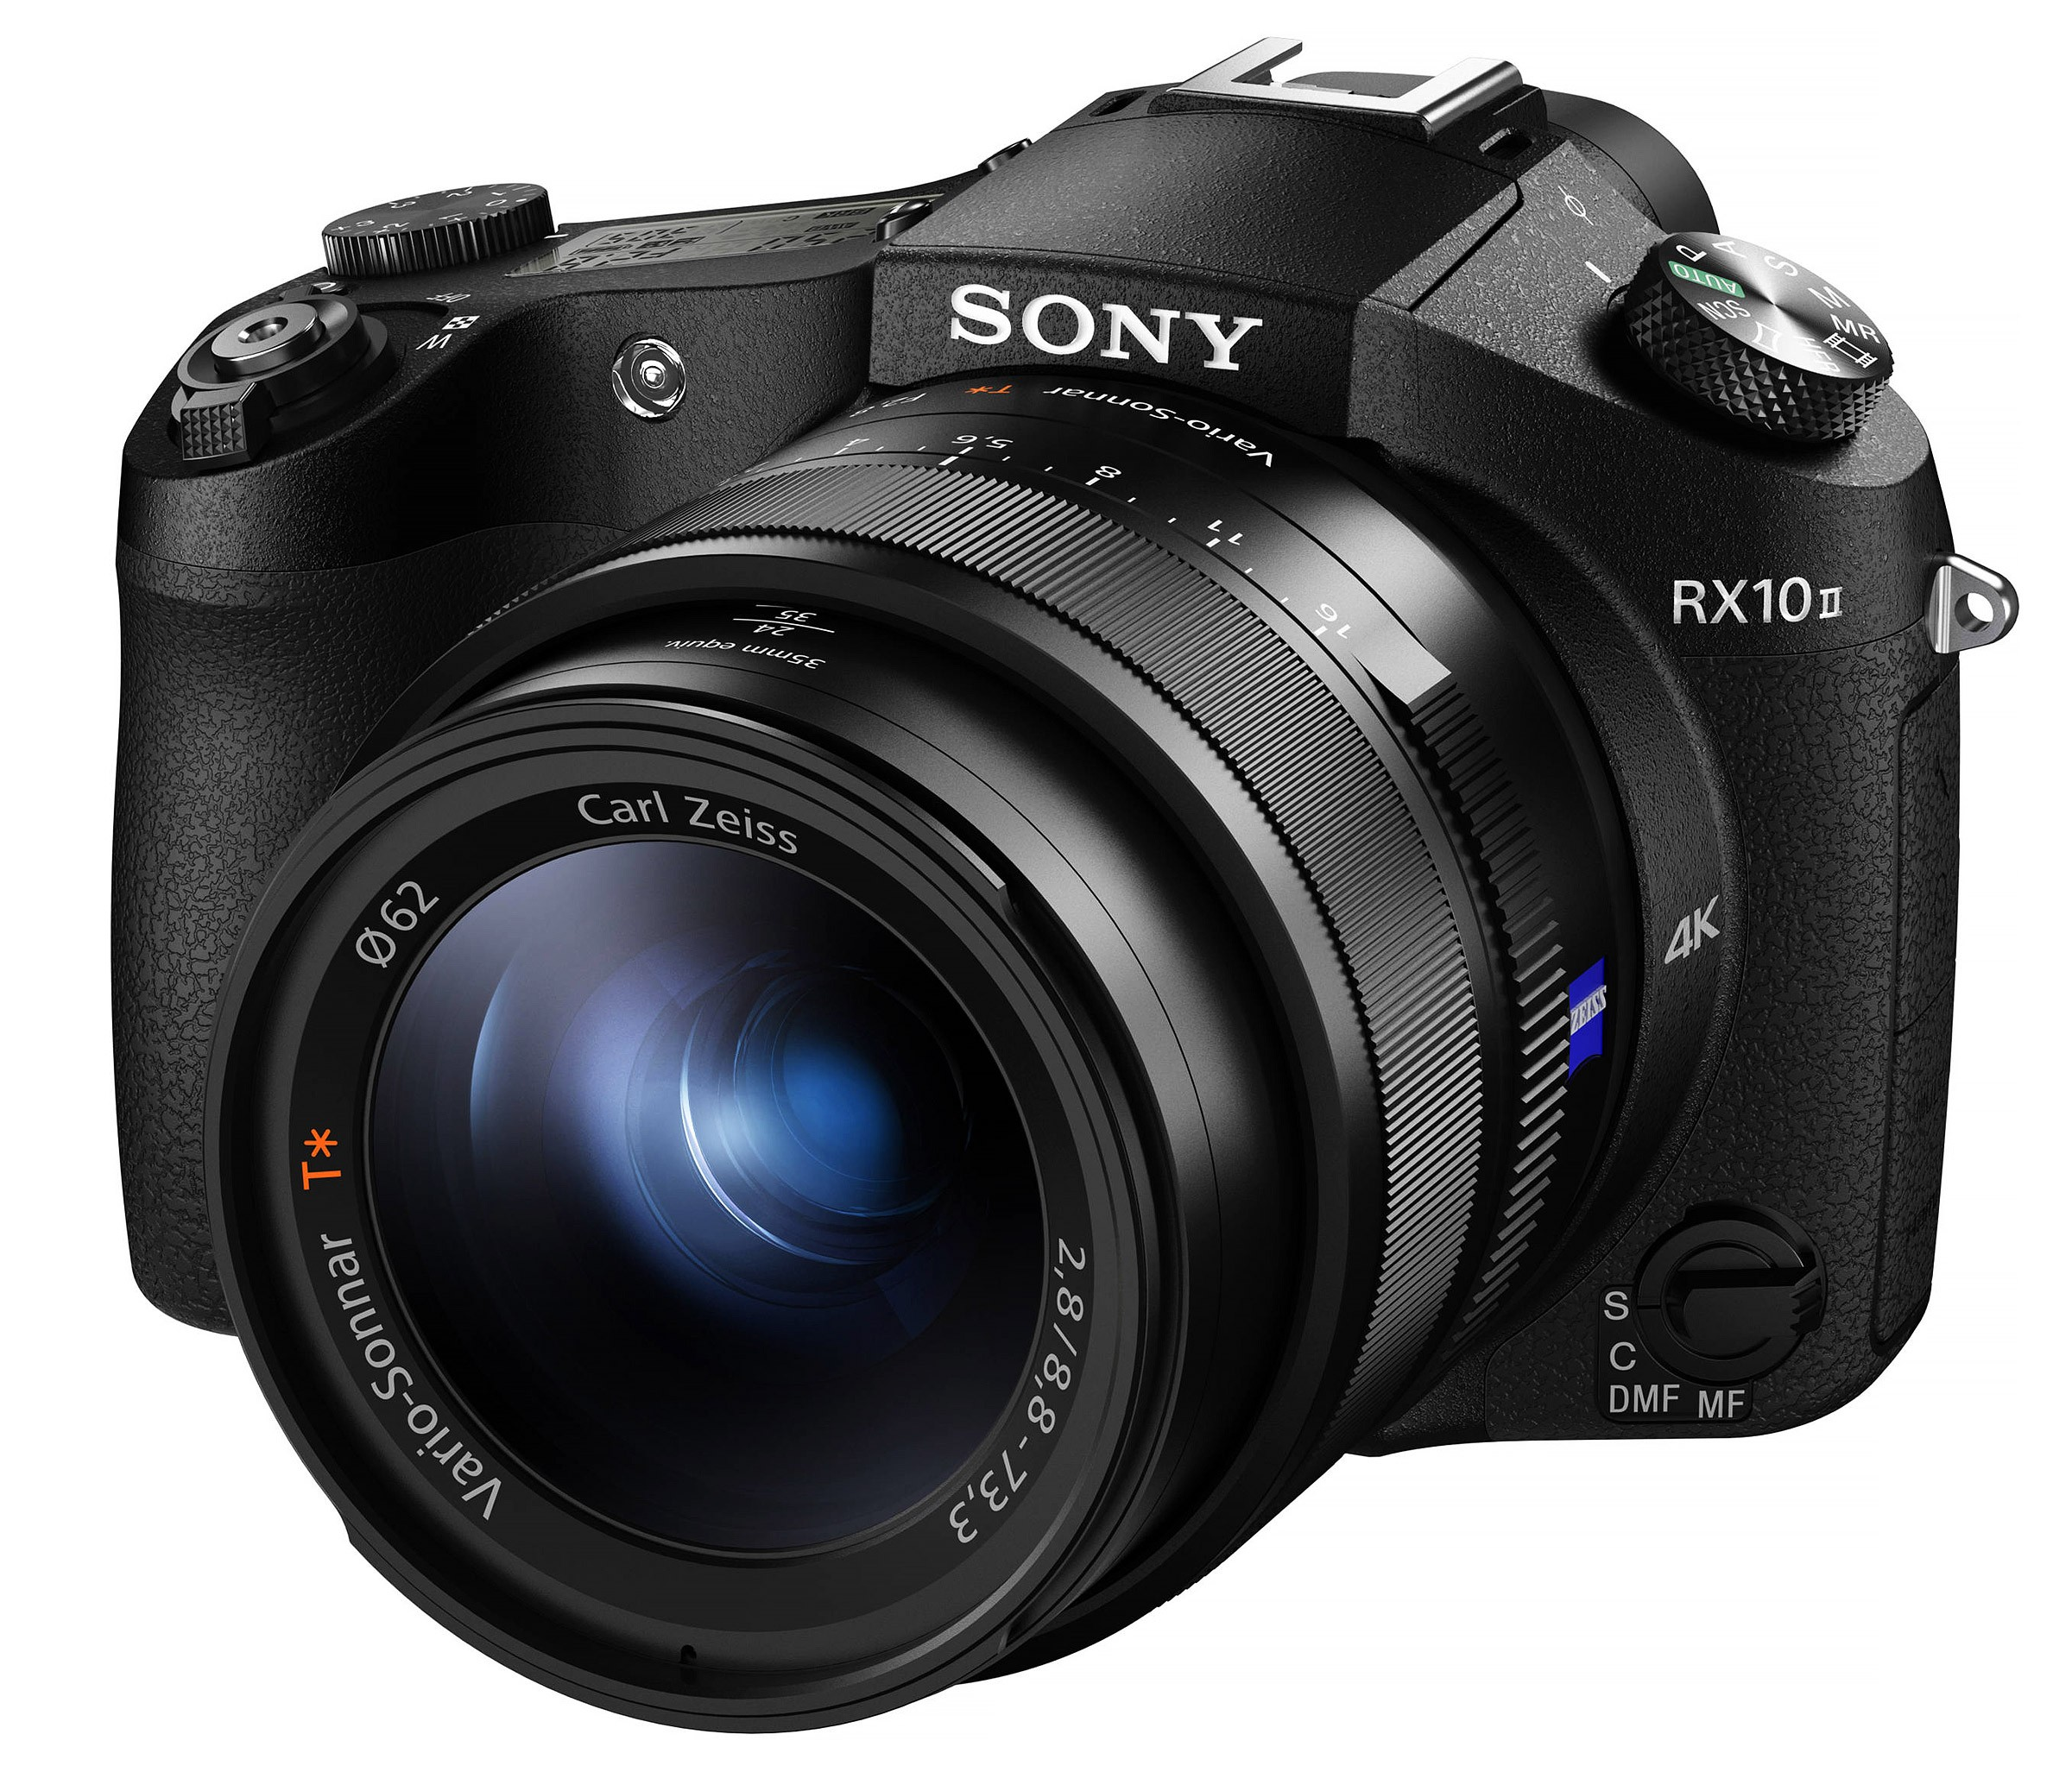 Fotocamera Compatta Sony Cyber-shot DSC-RX10 II Mark II